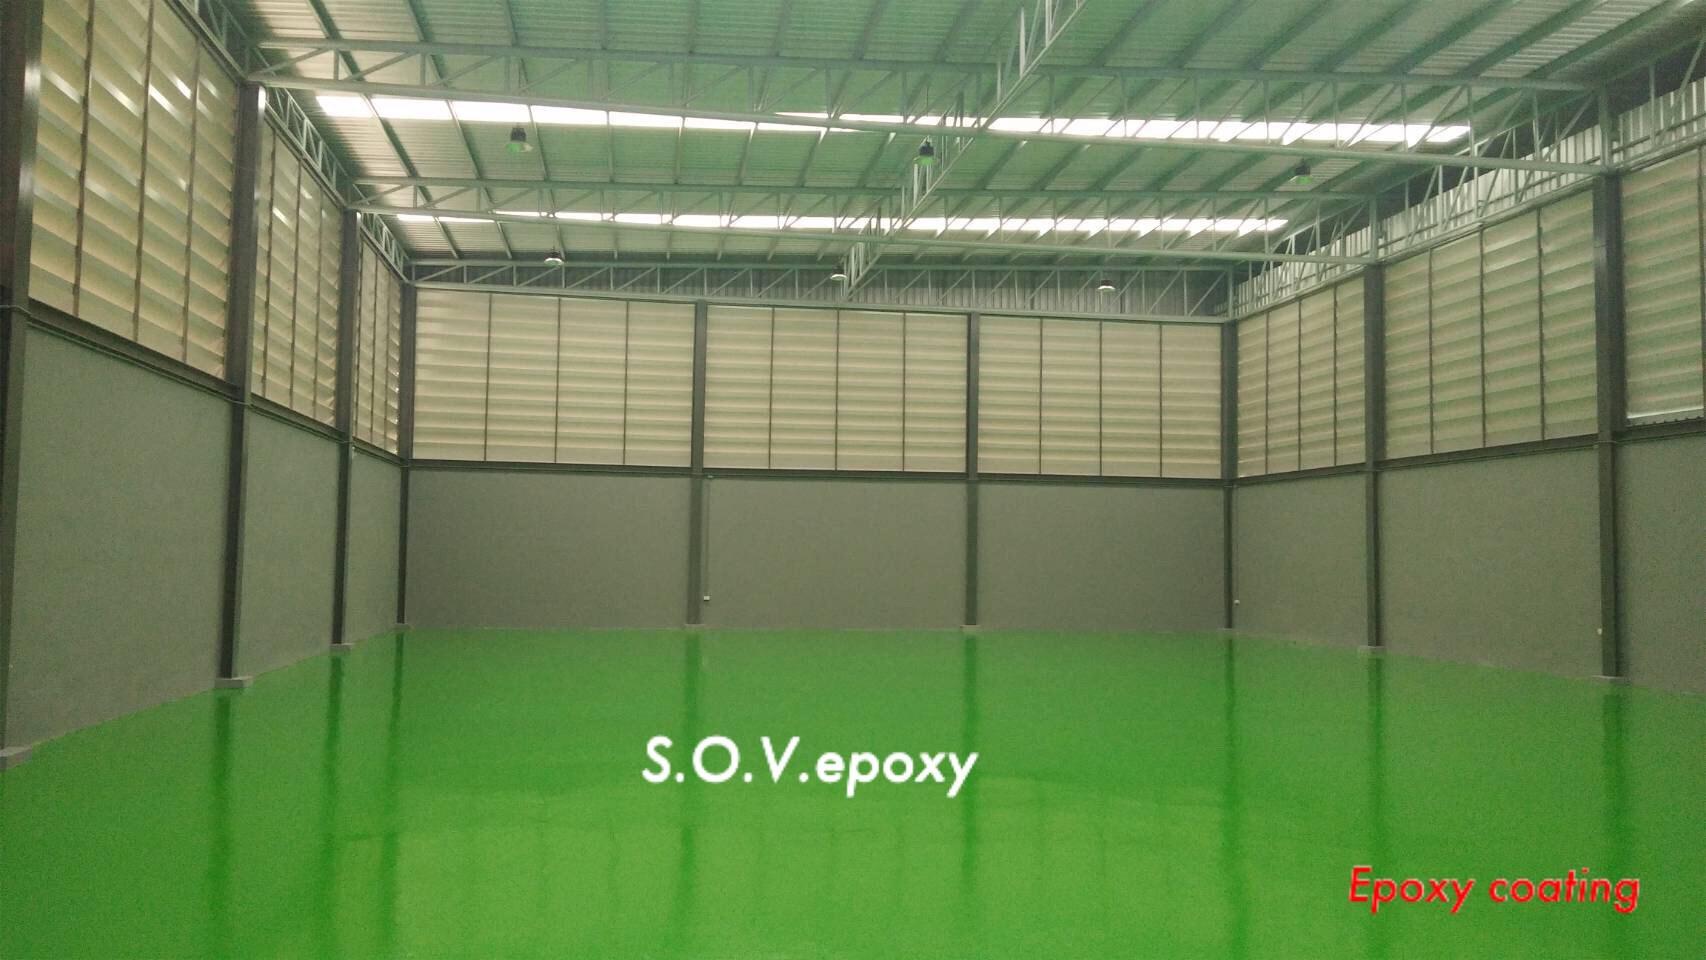 Epoxy Coating โกดังสินค้าสมุทรปราการ 1